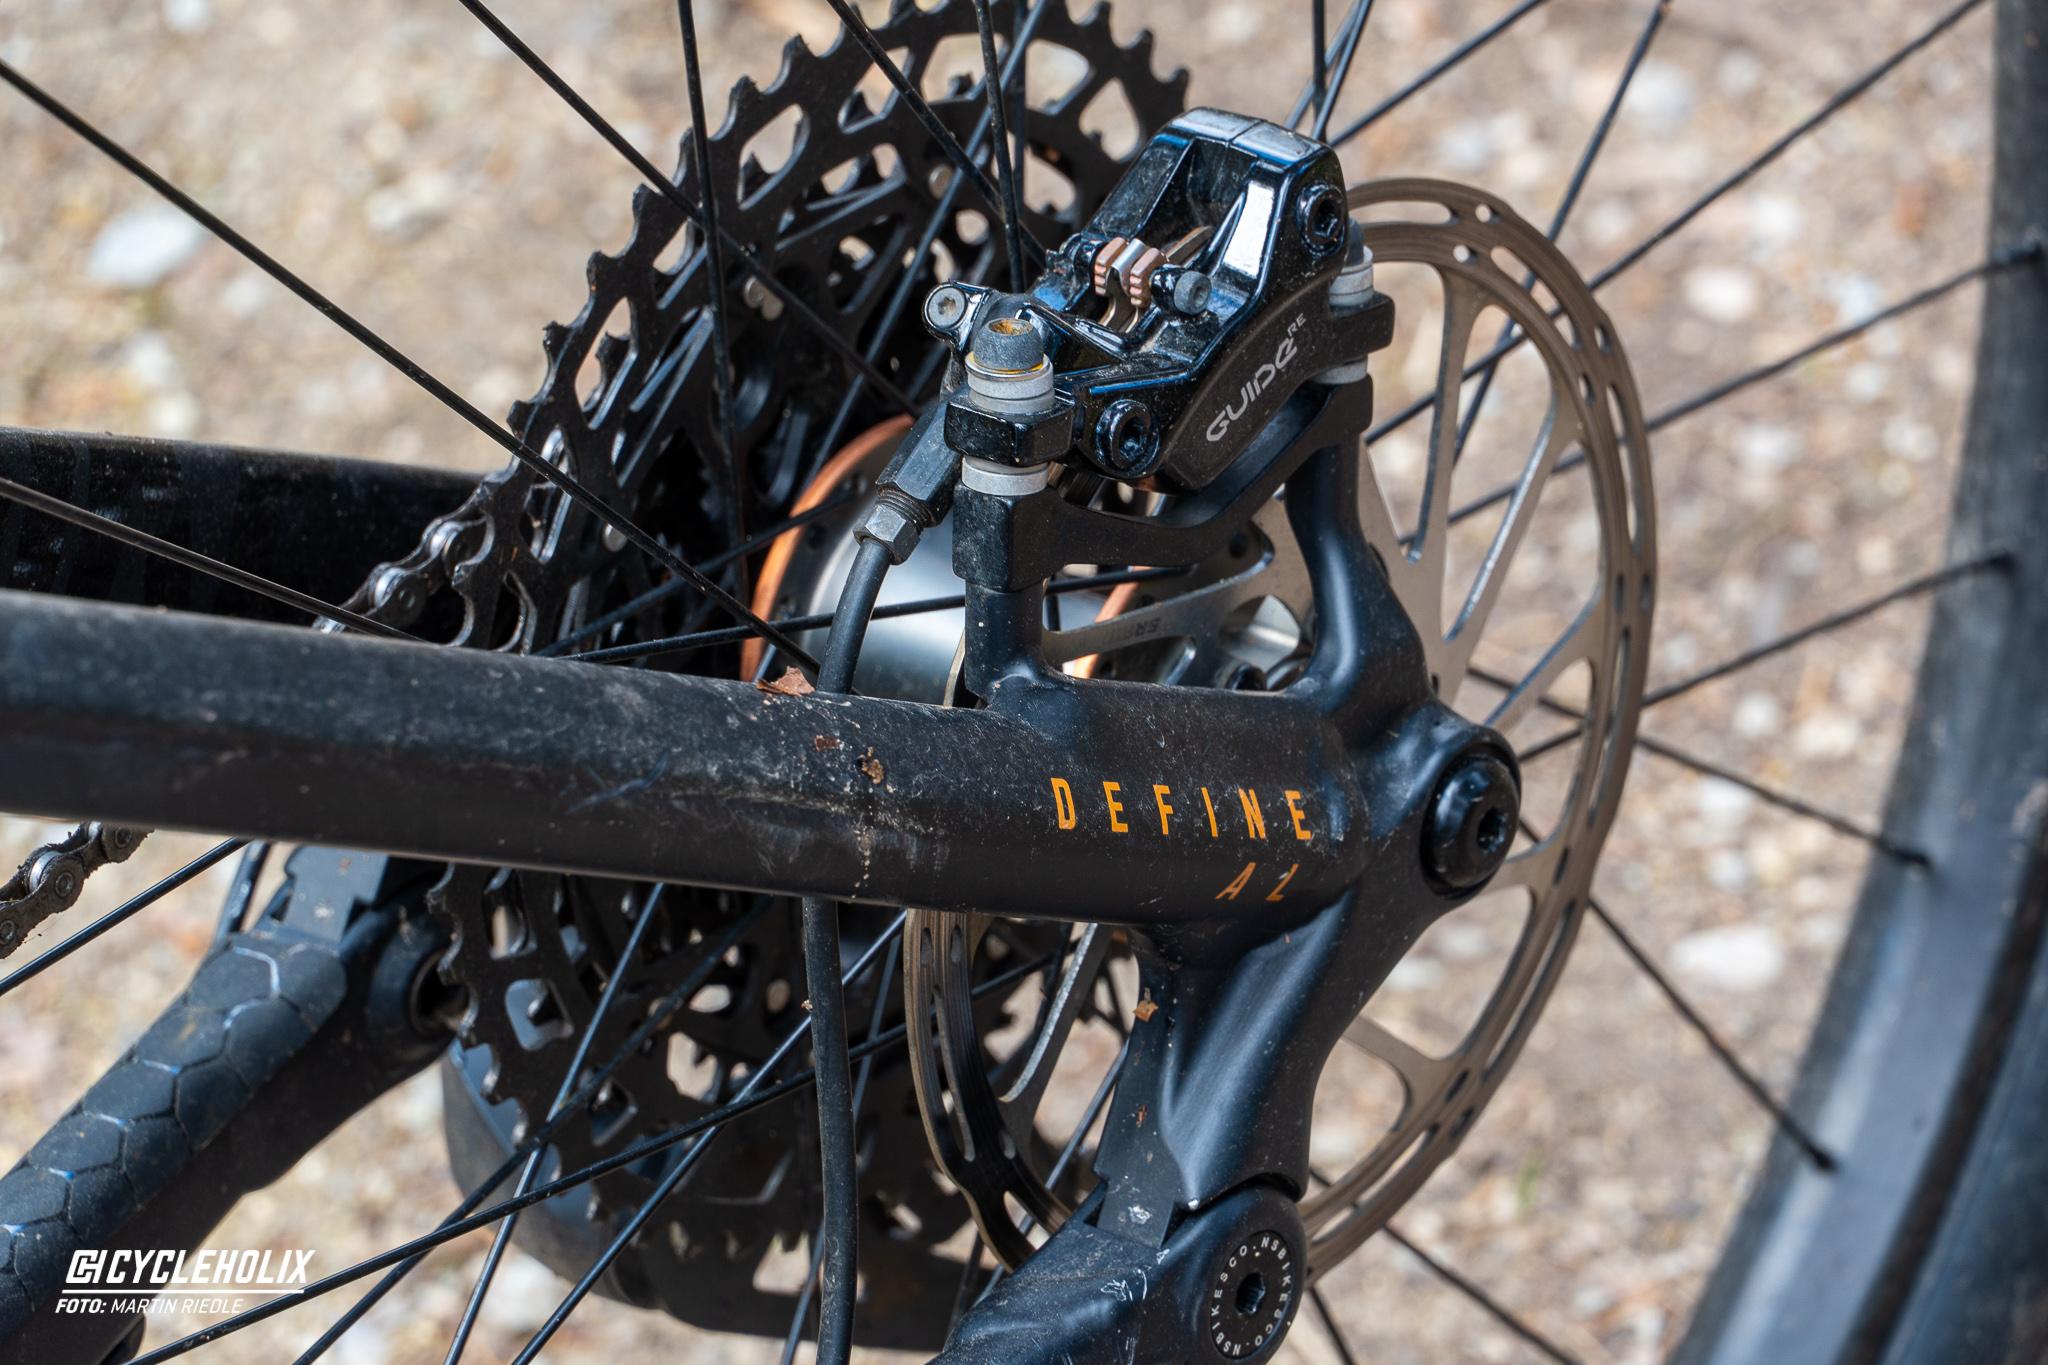 2021 NS Bikes Define 170 17 Cycleholix